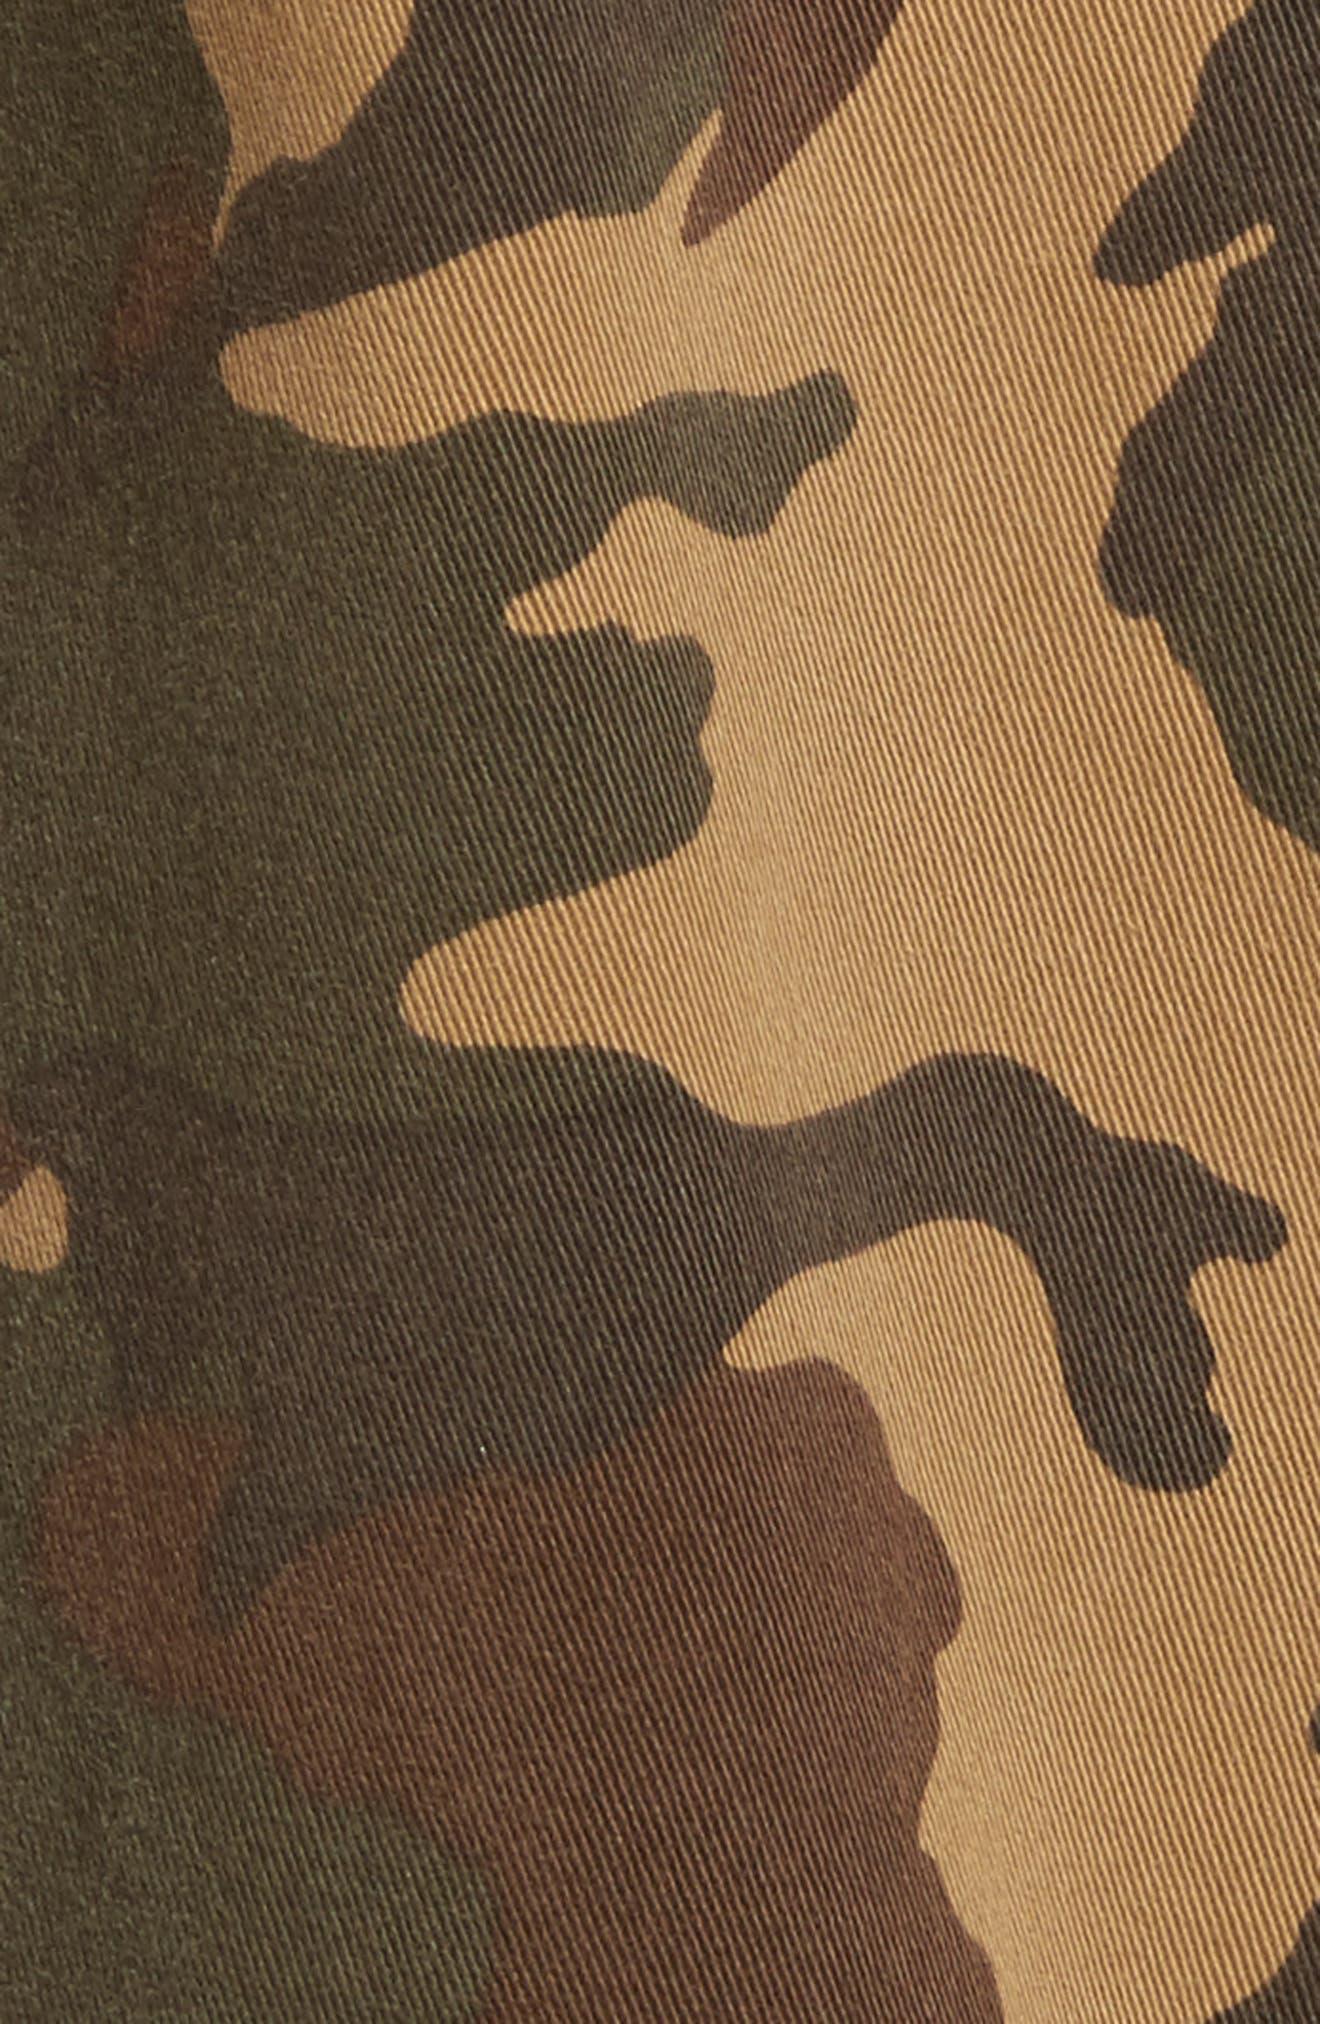 Alternate Image 5  - Proenza Schouler PSWL Camouflage Stretch Cotton Pants